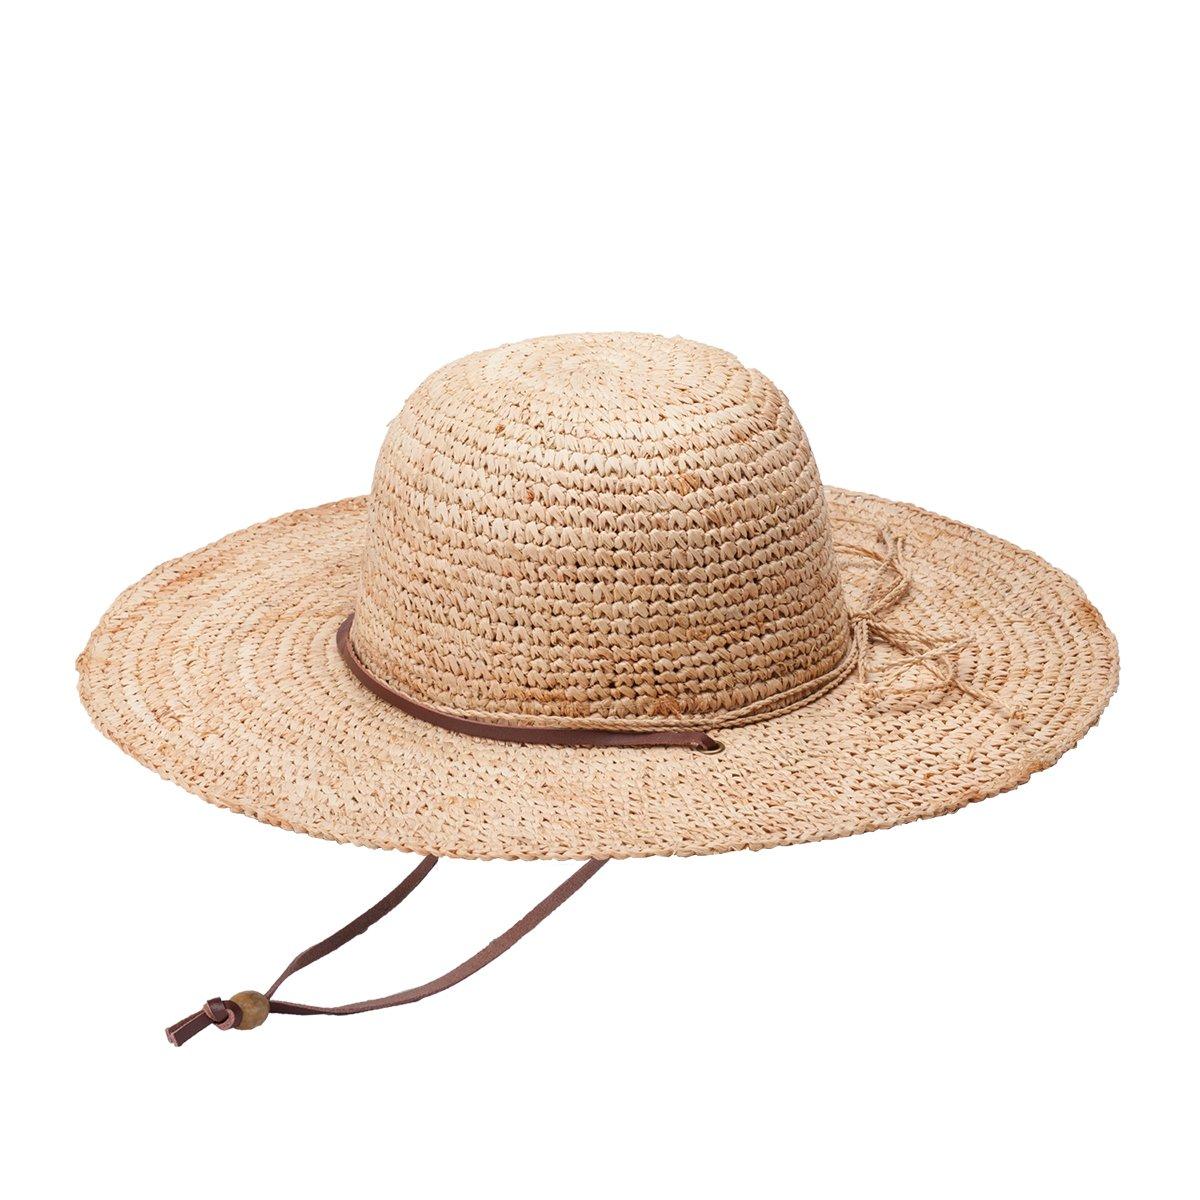 Peter Grimm Womens Ginko Resort Hat at Amazon Women s Clothing store  Sun  Hats 5726faade7b